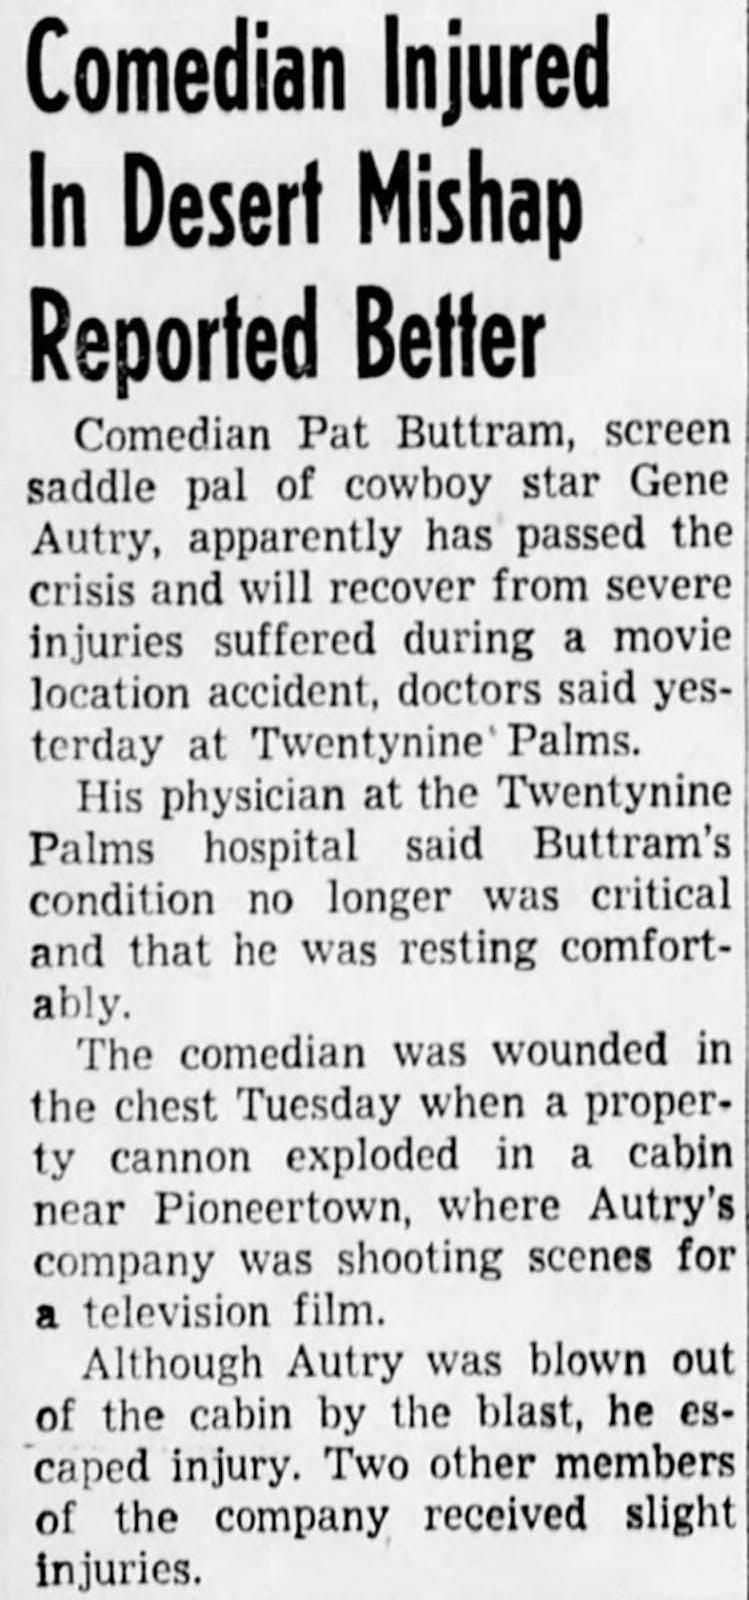 Sept. 15, 1950 - The San Bernardino County Sun